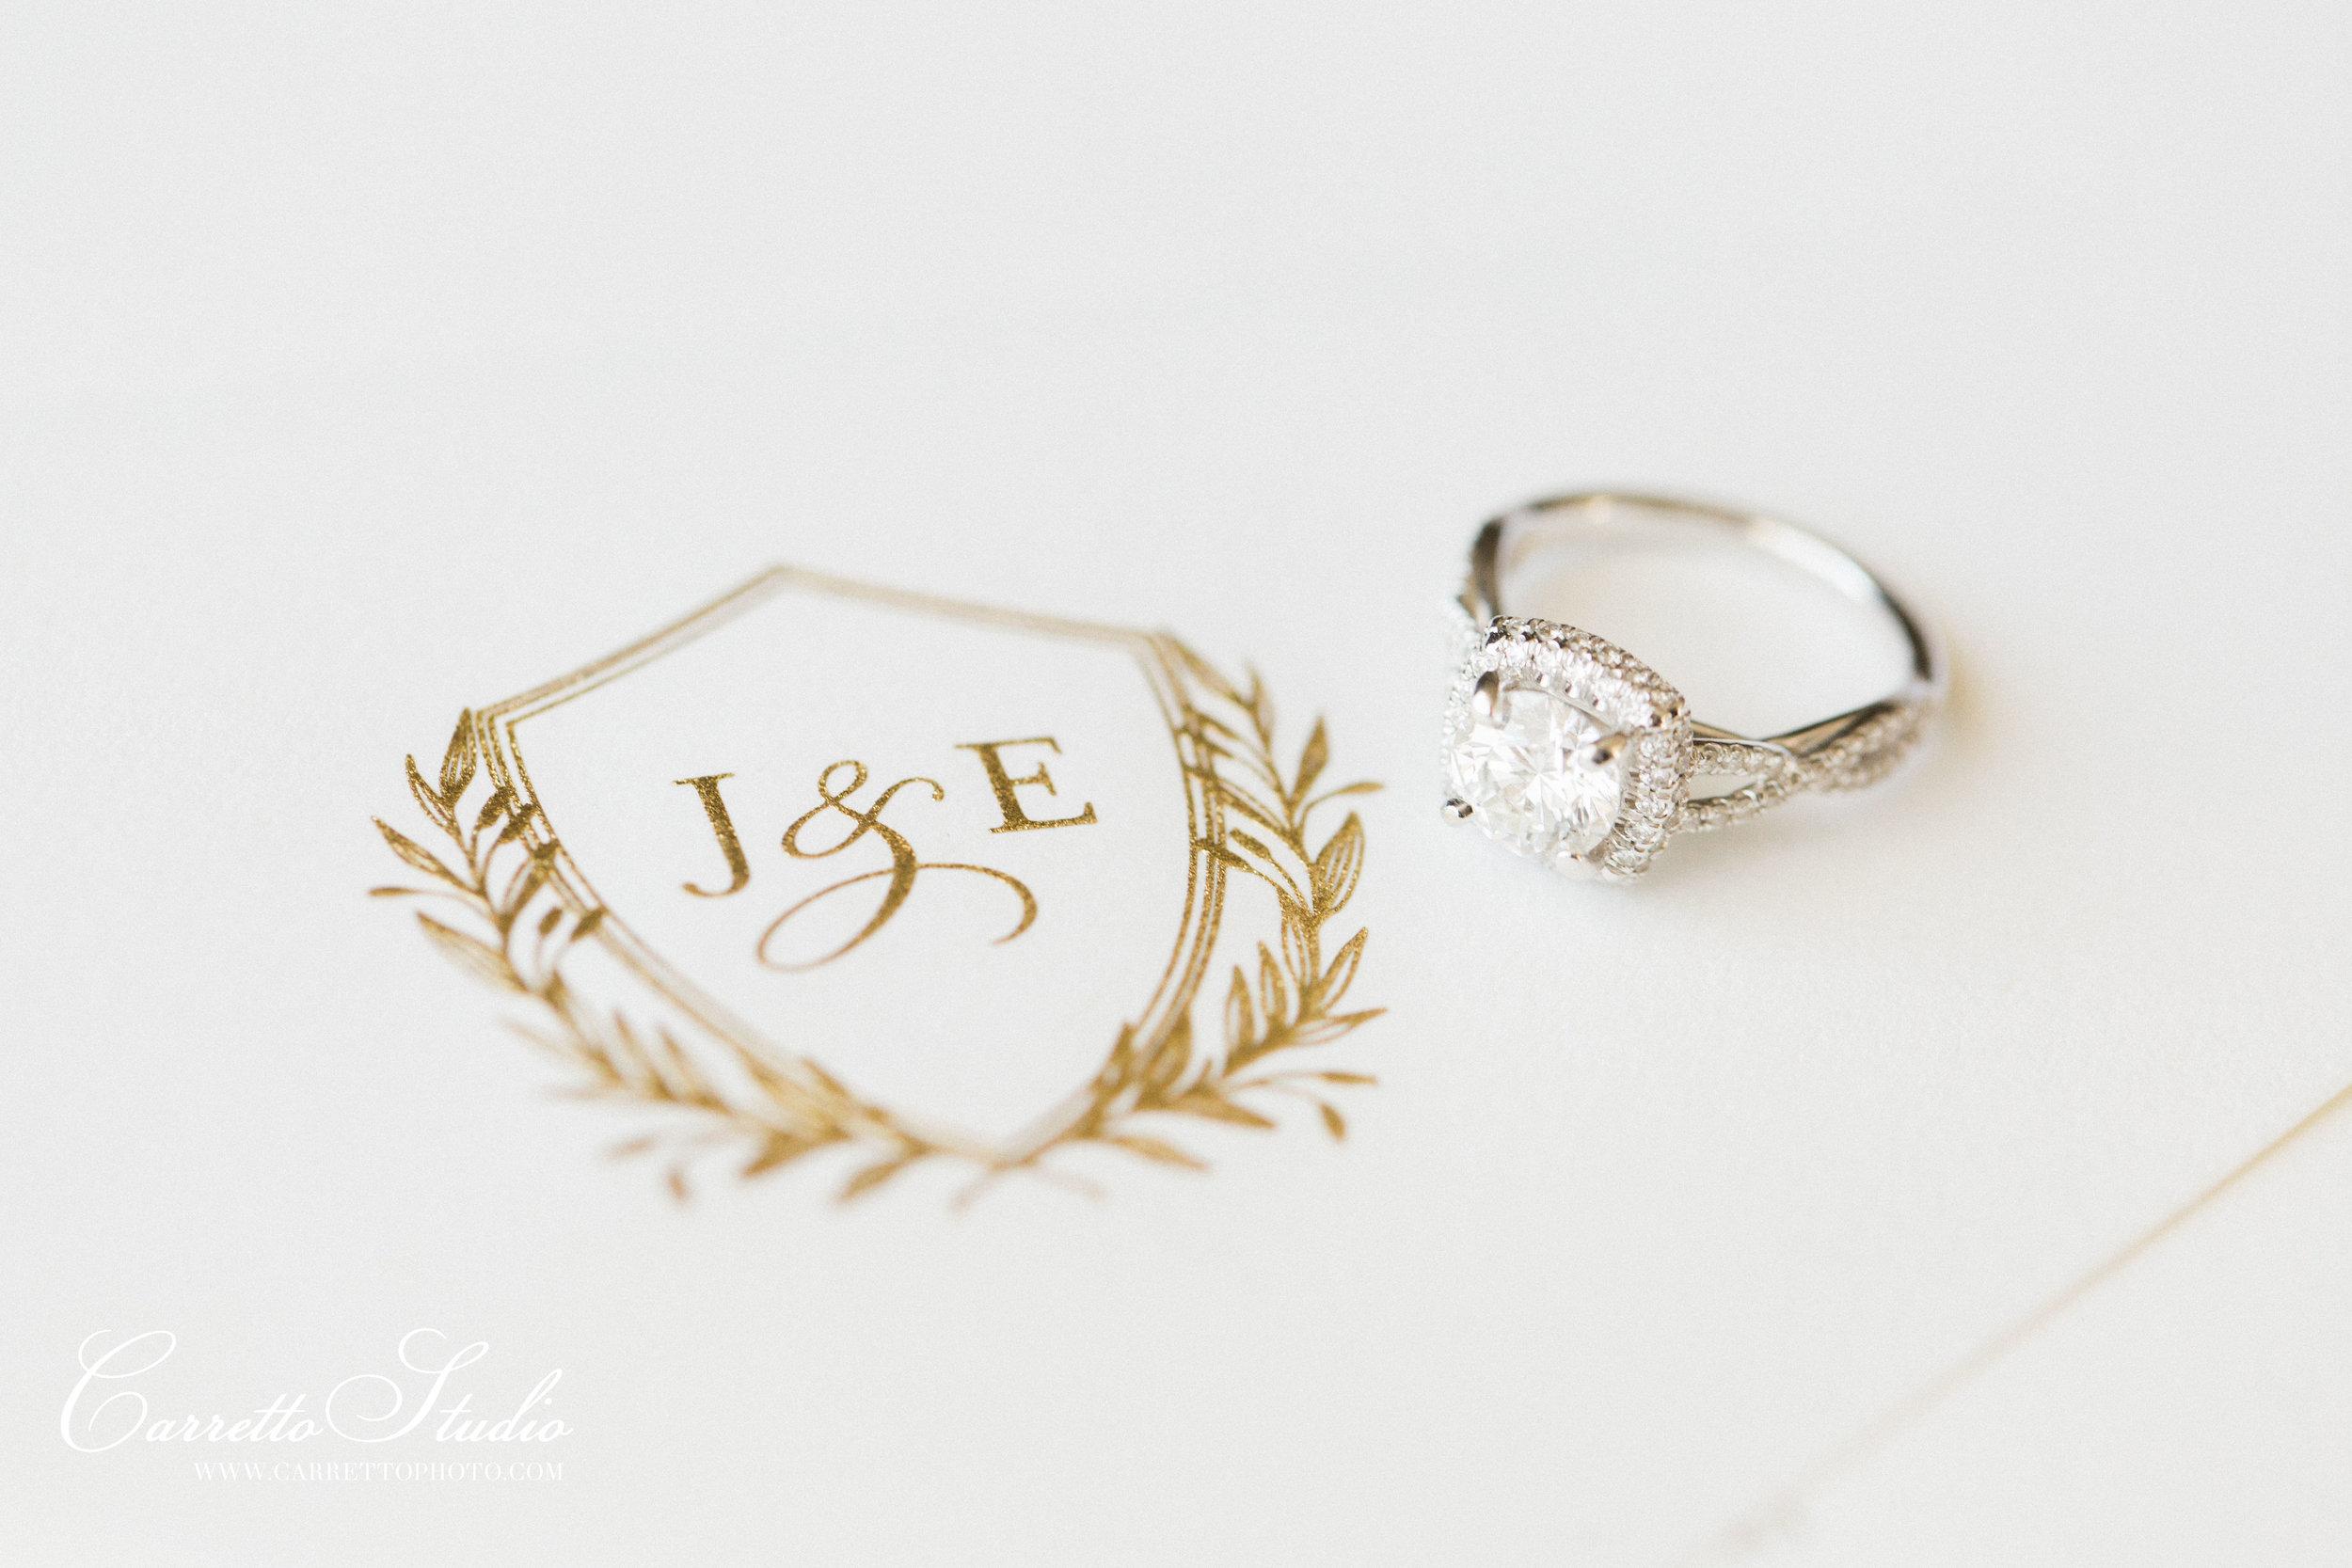 Jessica-Liu-Wedding 1.jpg